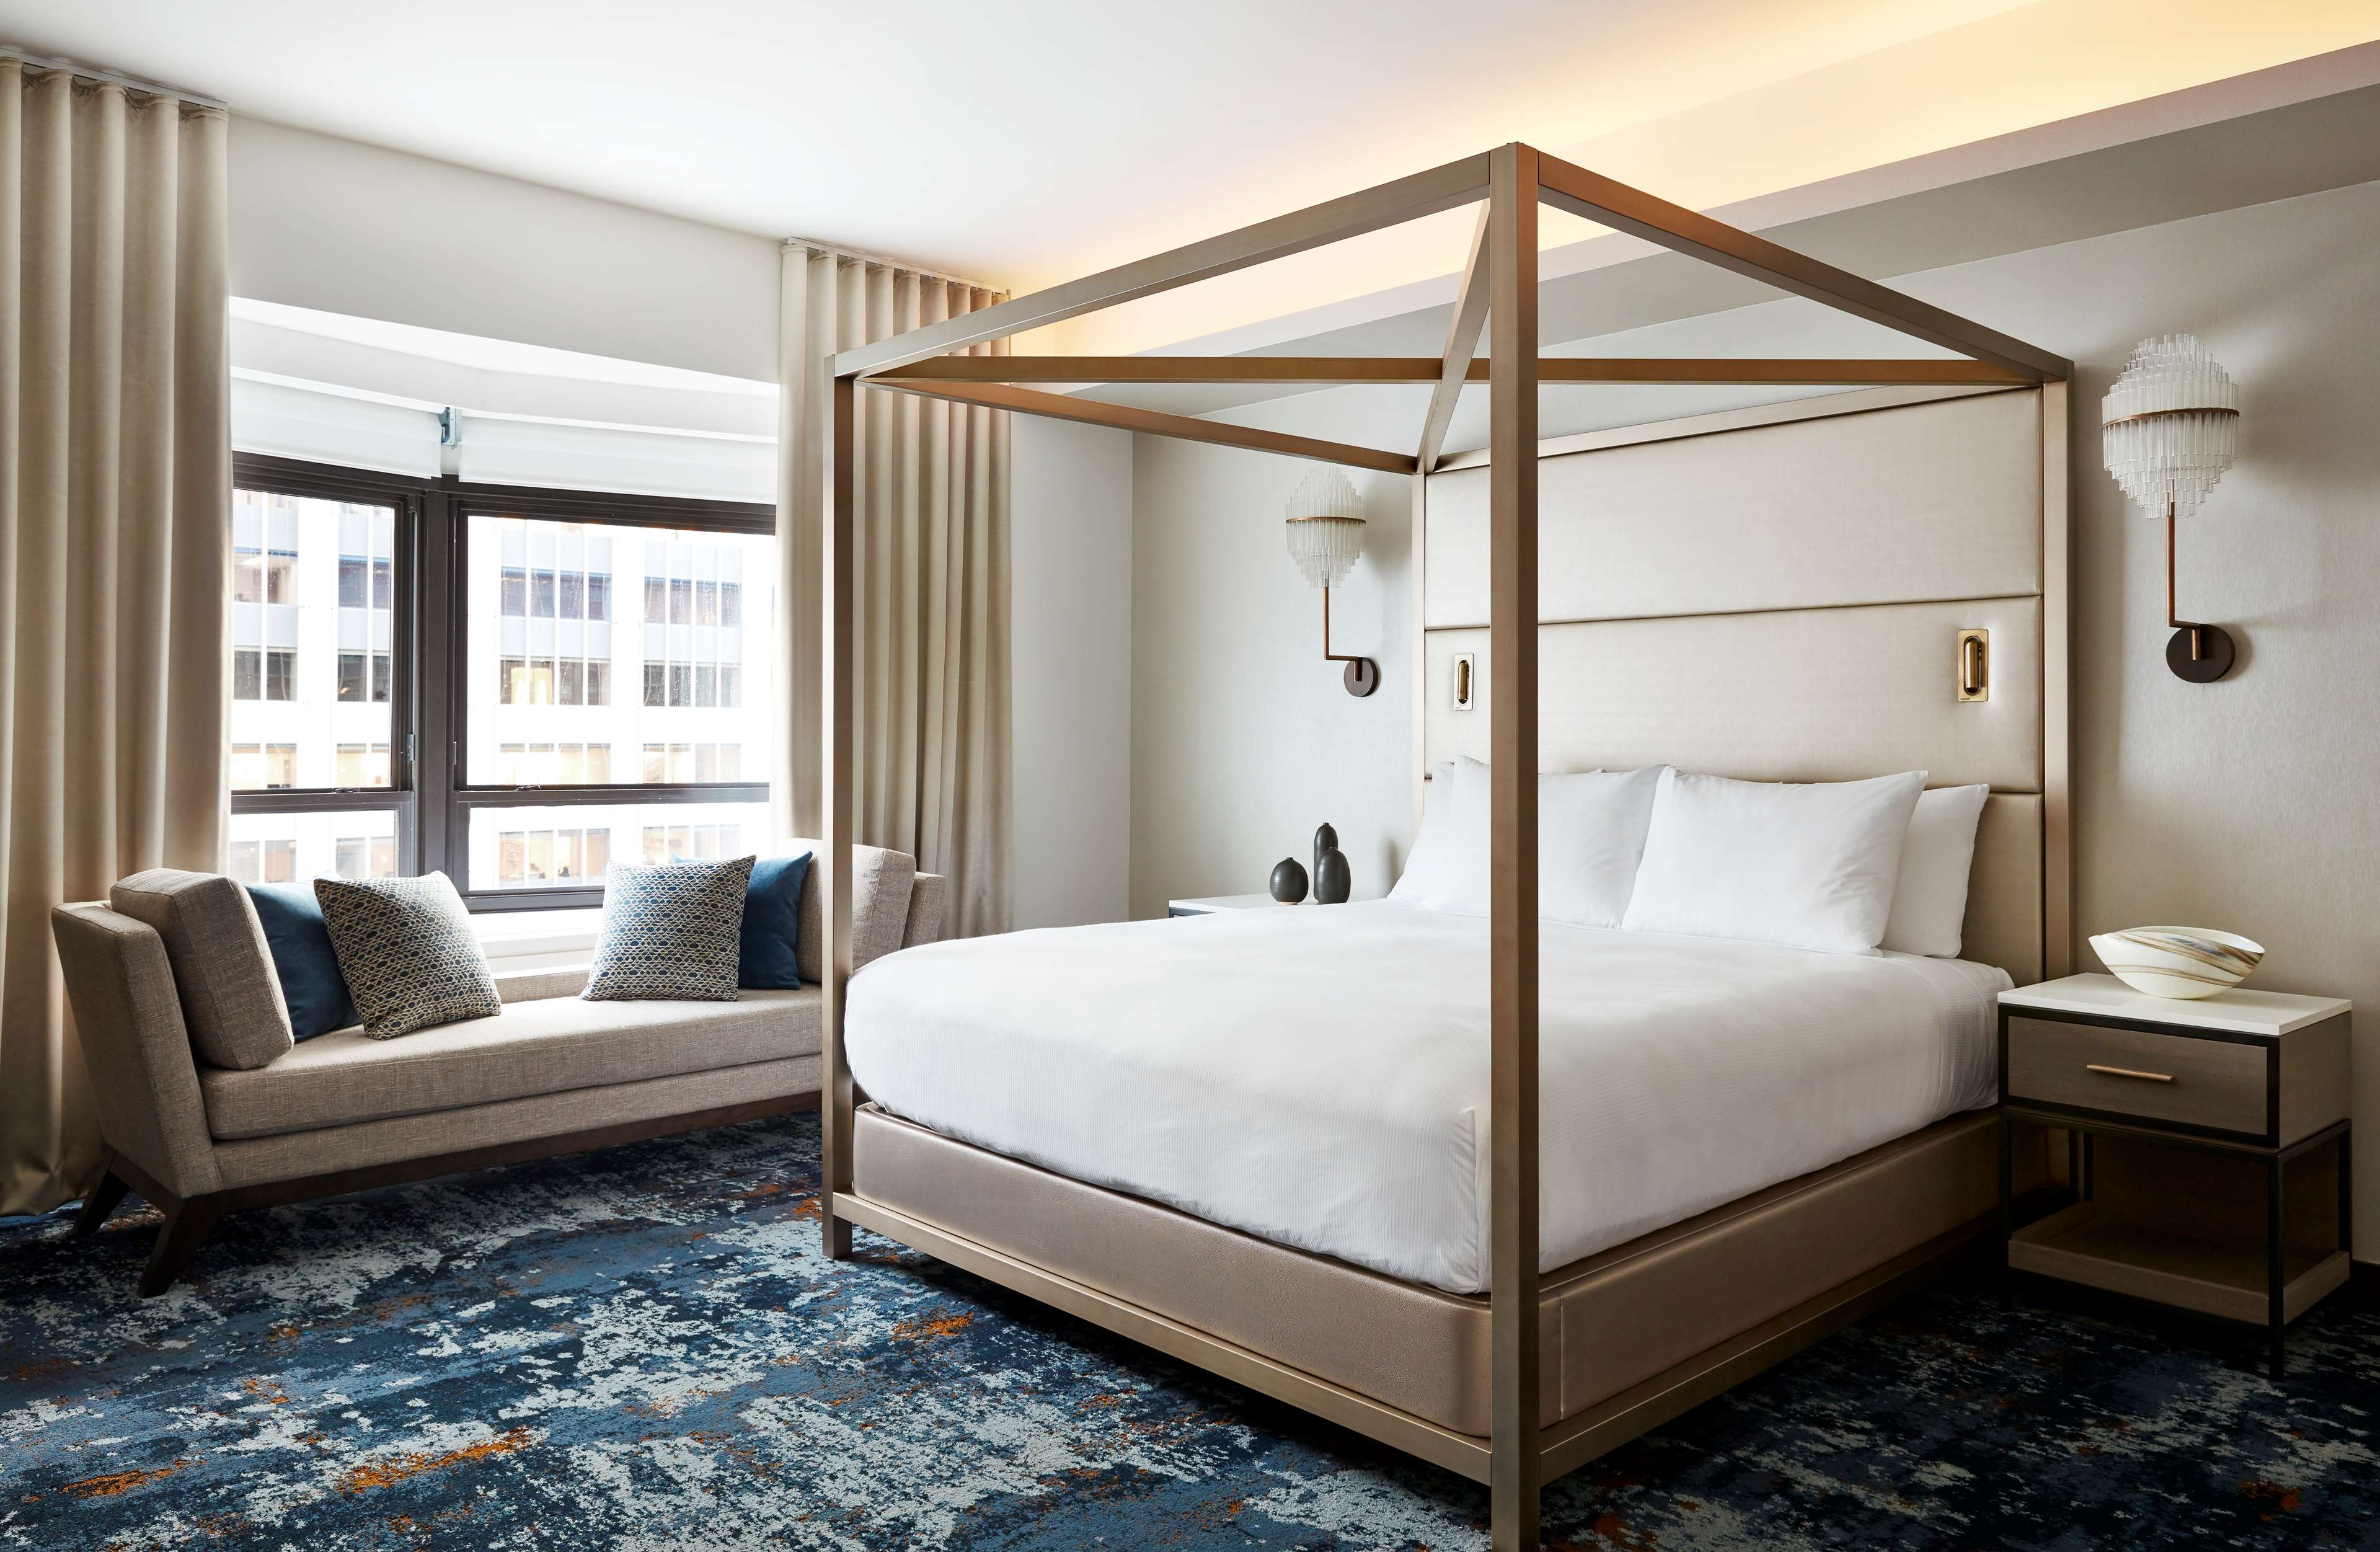 New York Hilton Midtown image 16